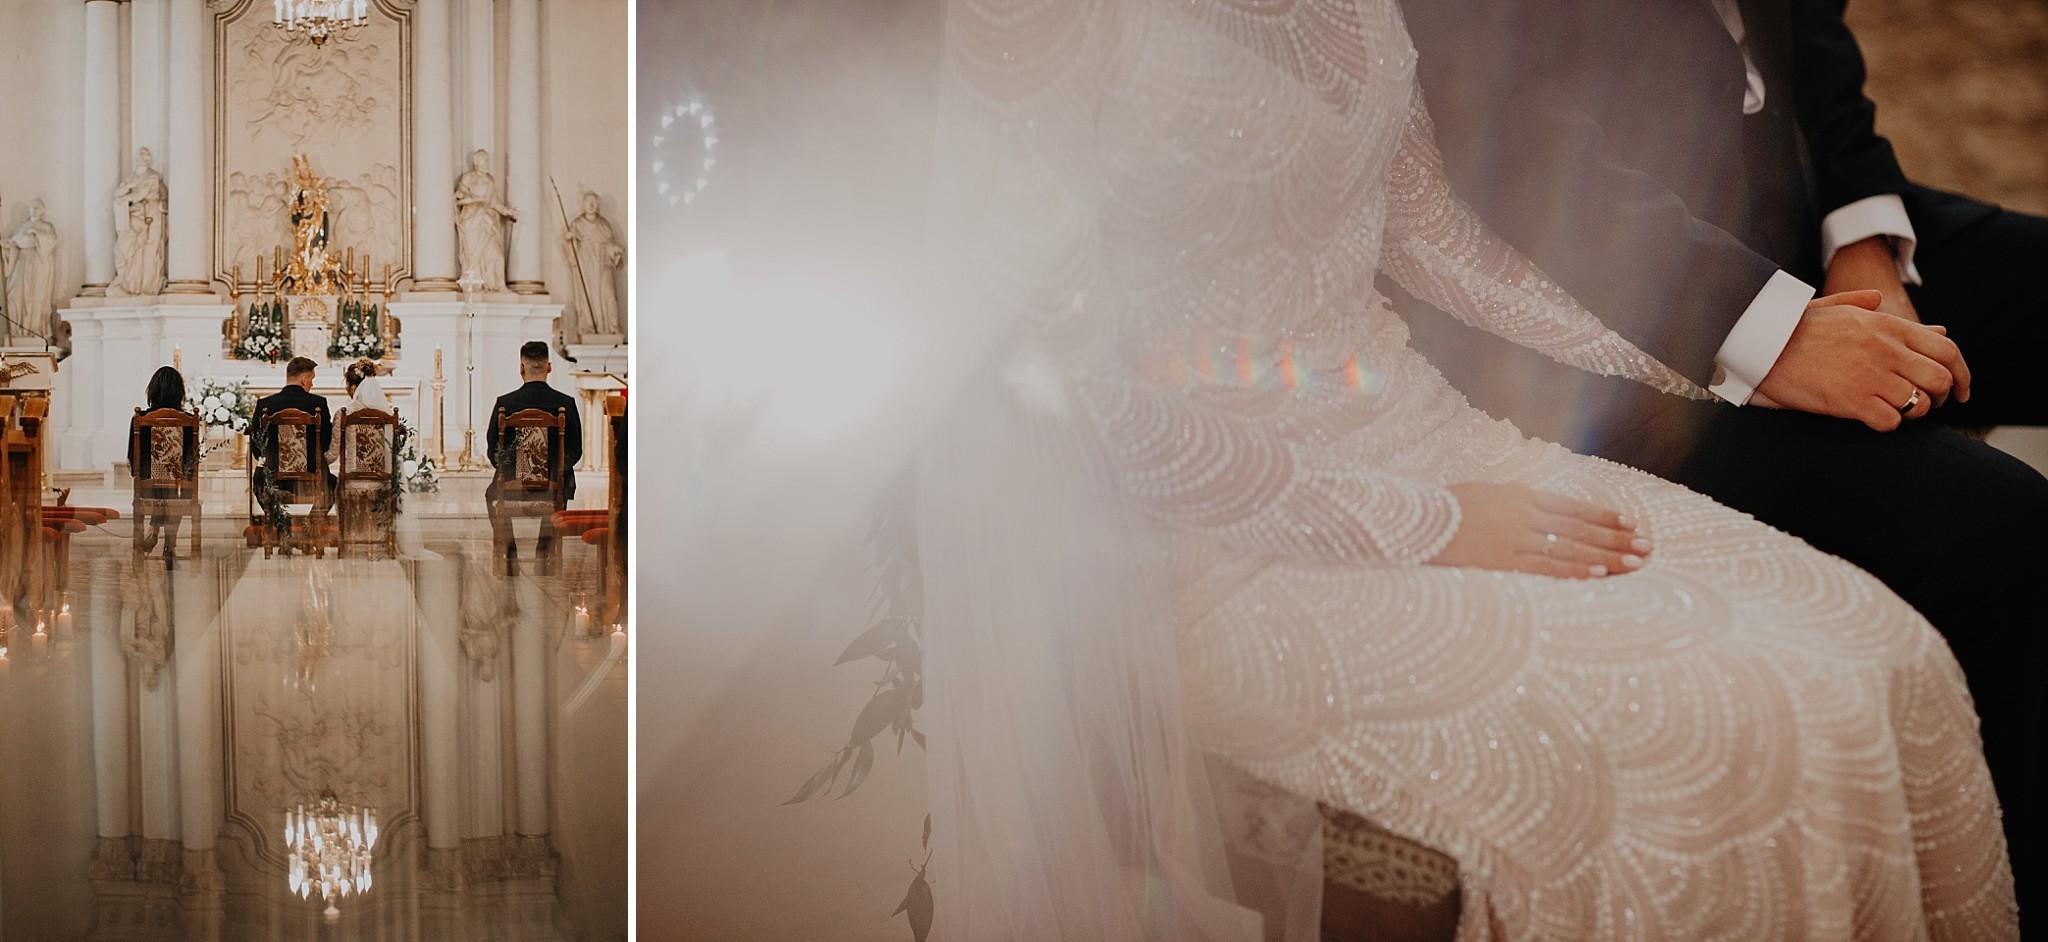 fotograf poznan wesele dobra truskawka piekne wesele pod poznaniem wesele w dobrej truskawce piekna para mloda slub marzen slub koronawirus slub listopad wesele koronawirus 158